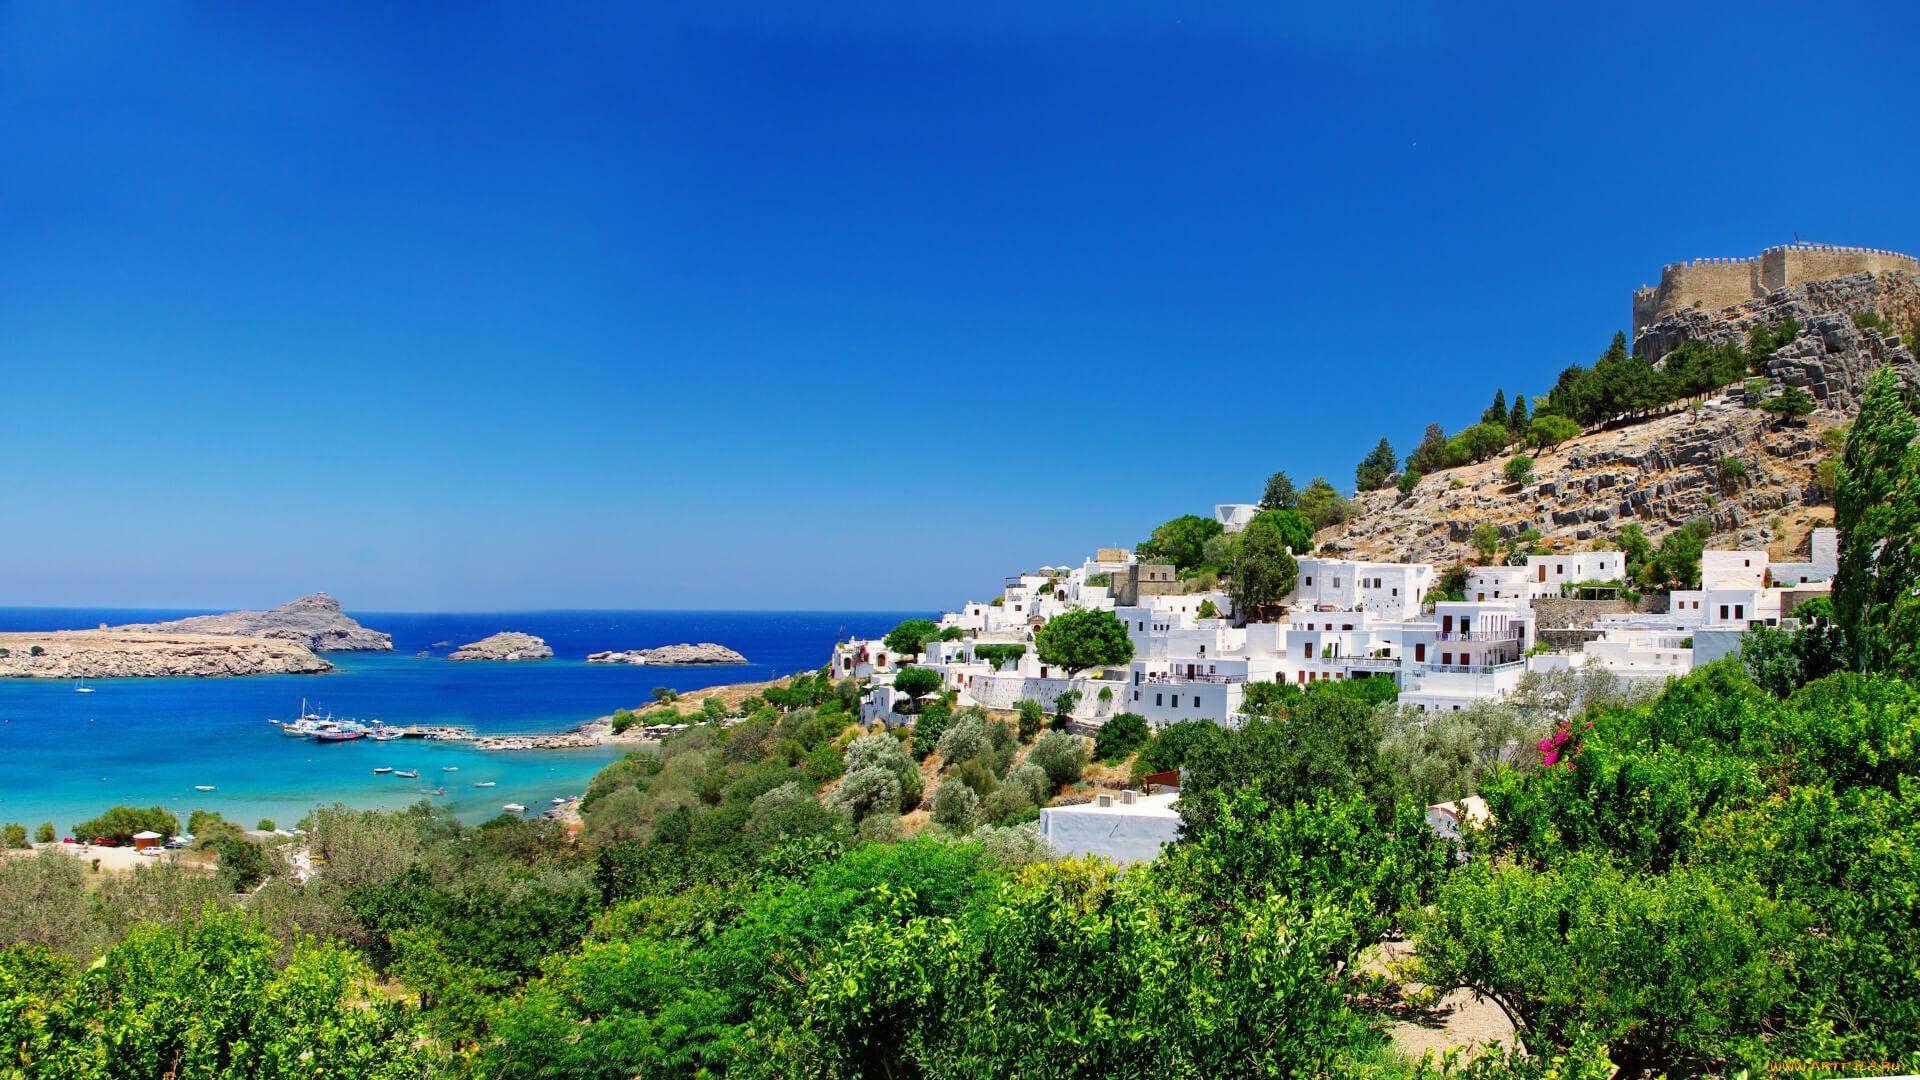 Остров Родос - Древний город Линдос